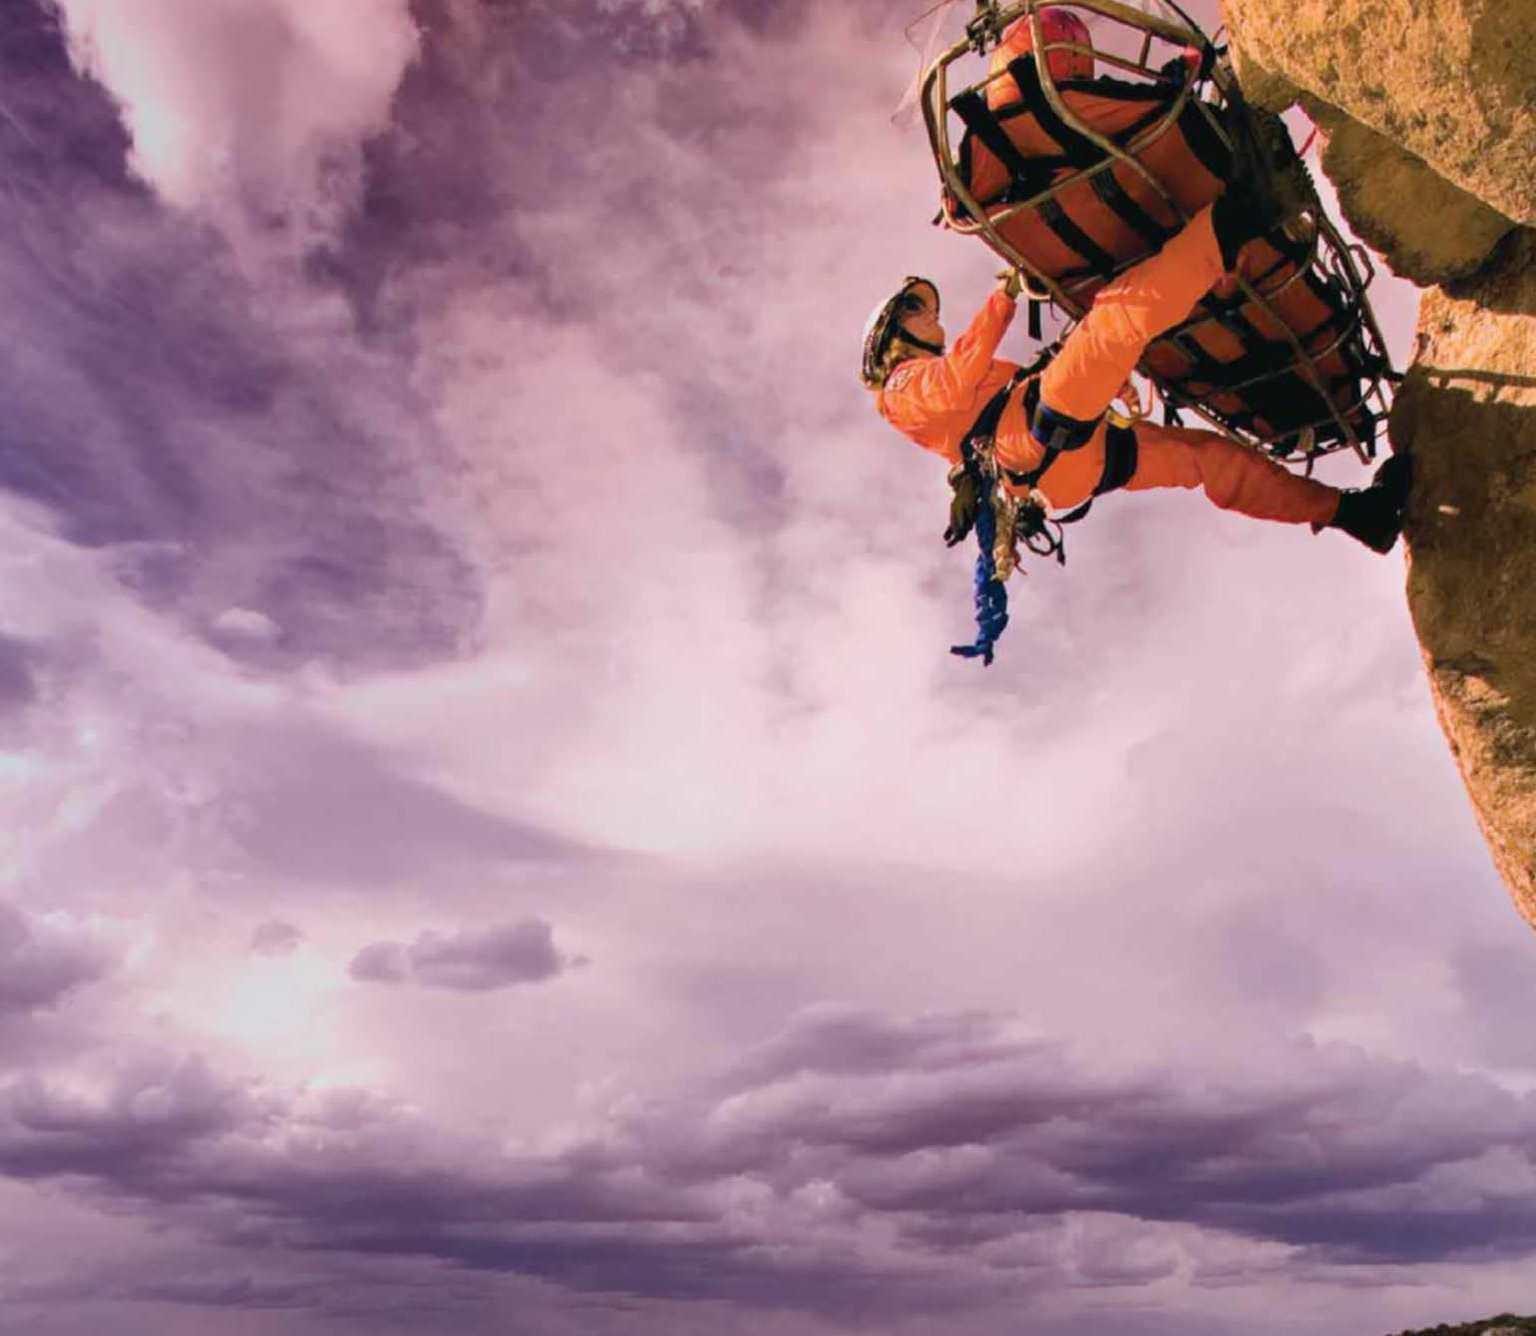 Survival Guide - Top Tips From A Veteran Ranger